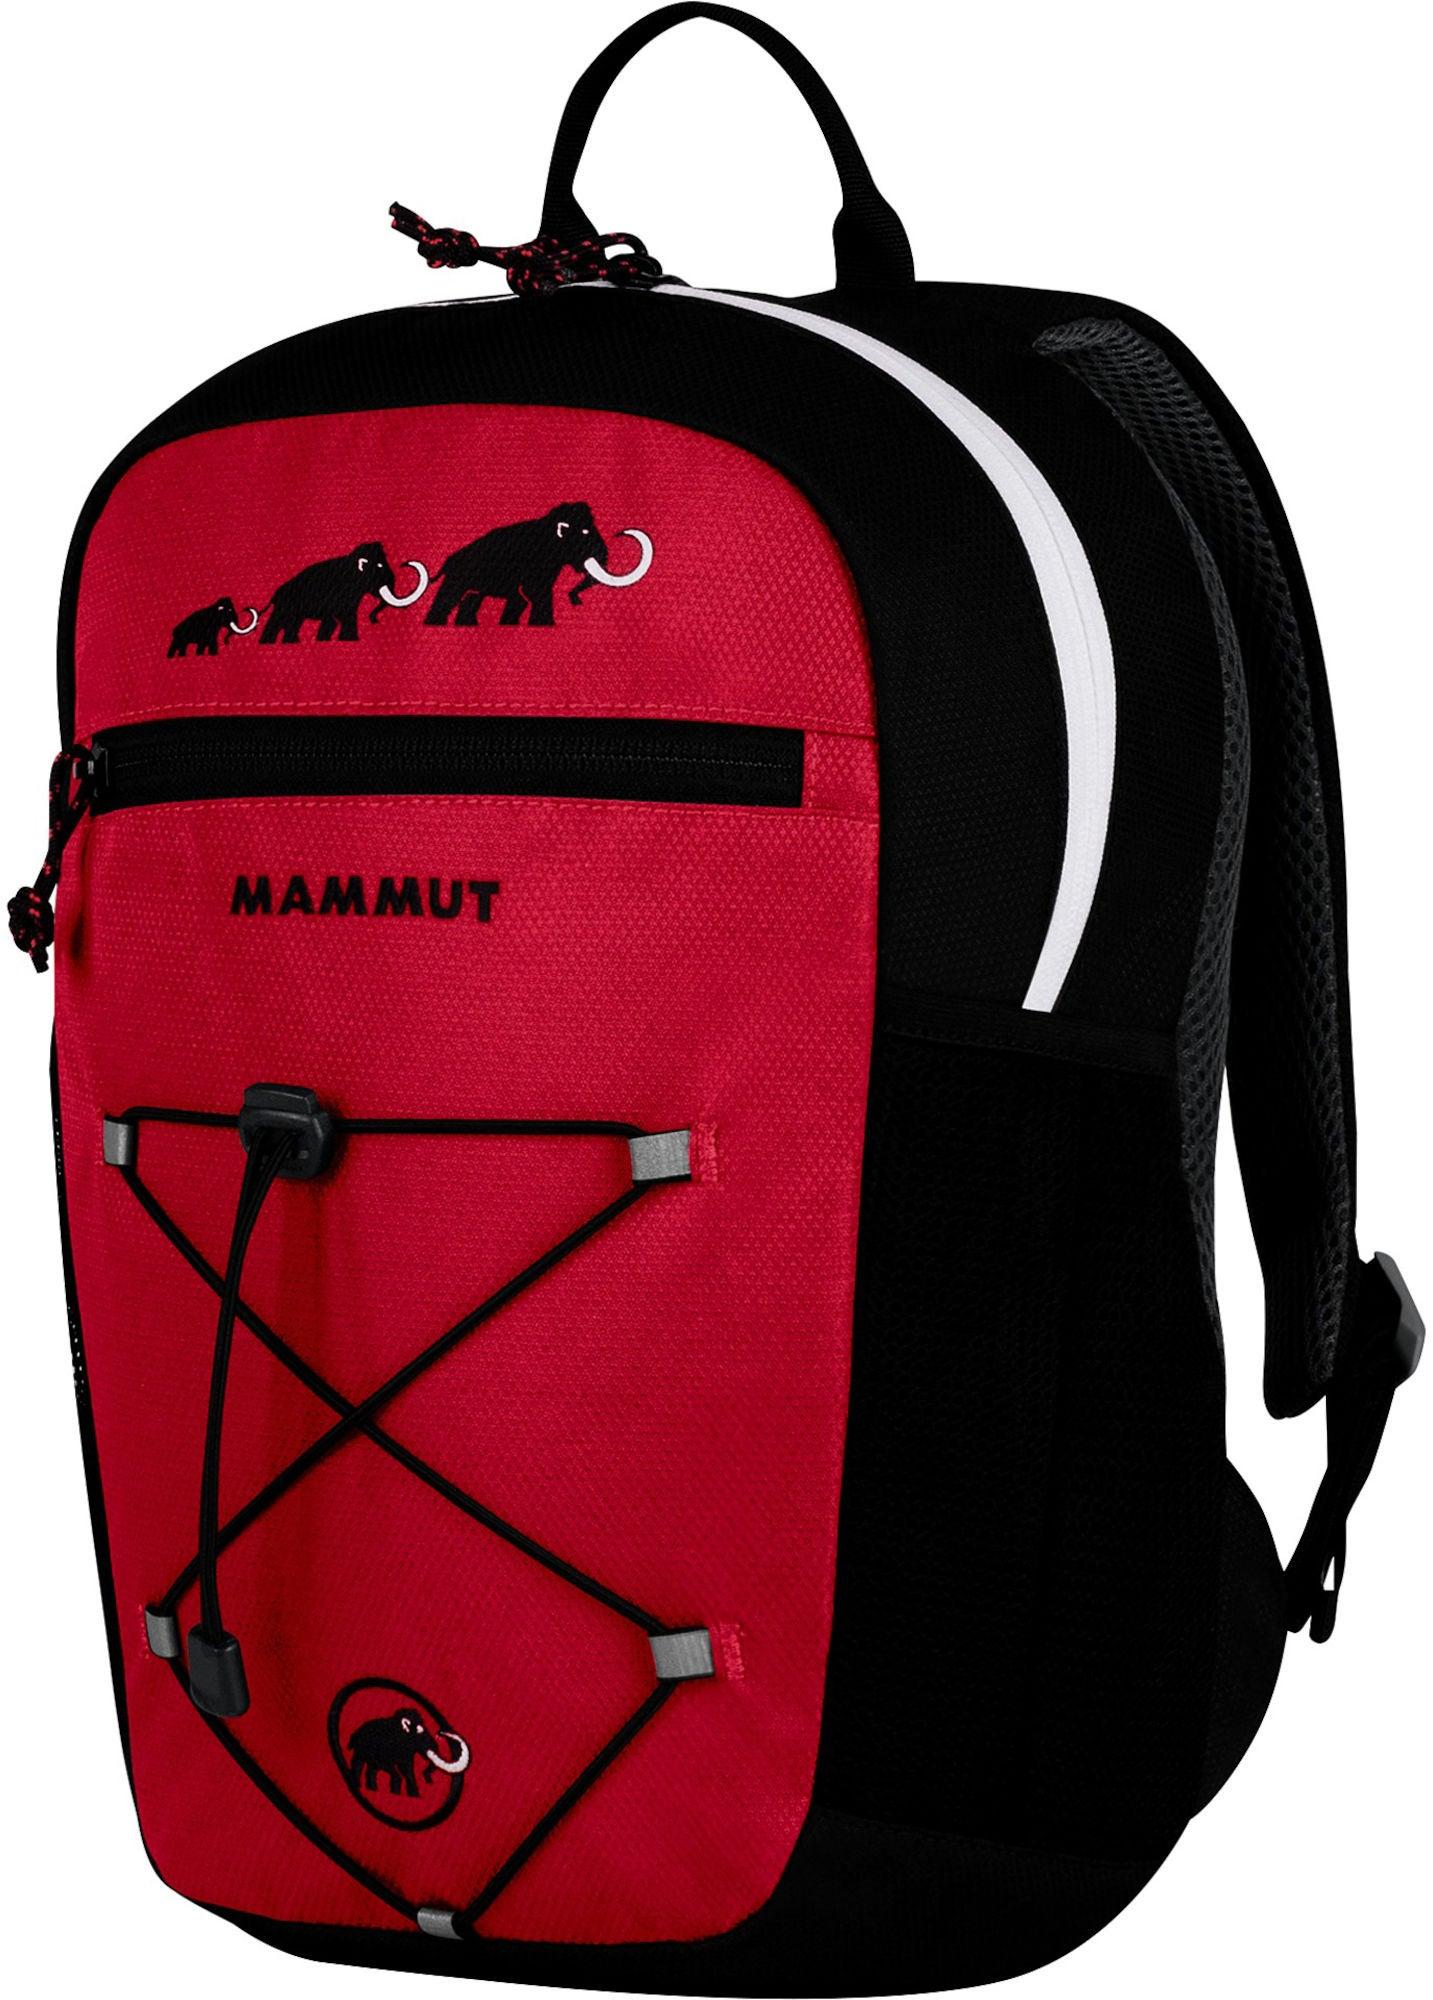 Mammut First Zip Ryggsekk 16L, Black Inferno